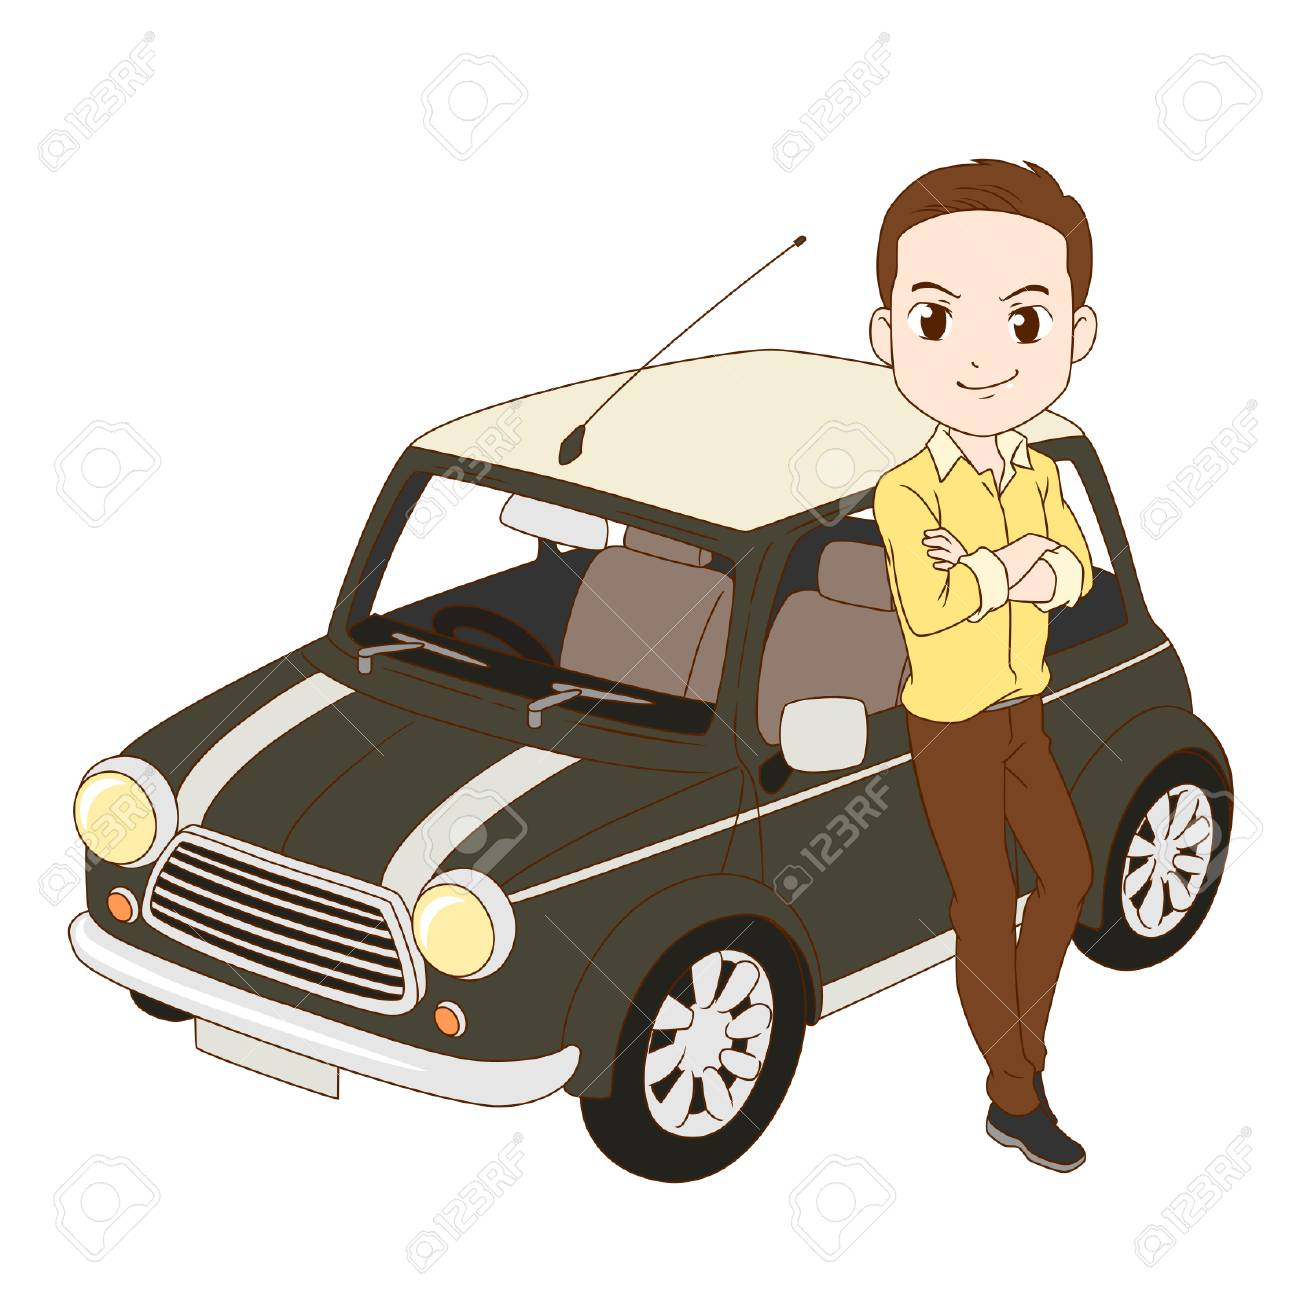 The man and mini cooper car. - 92717186